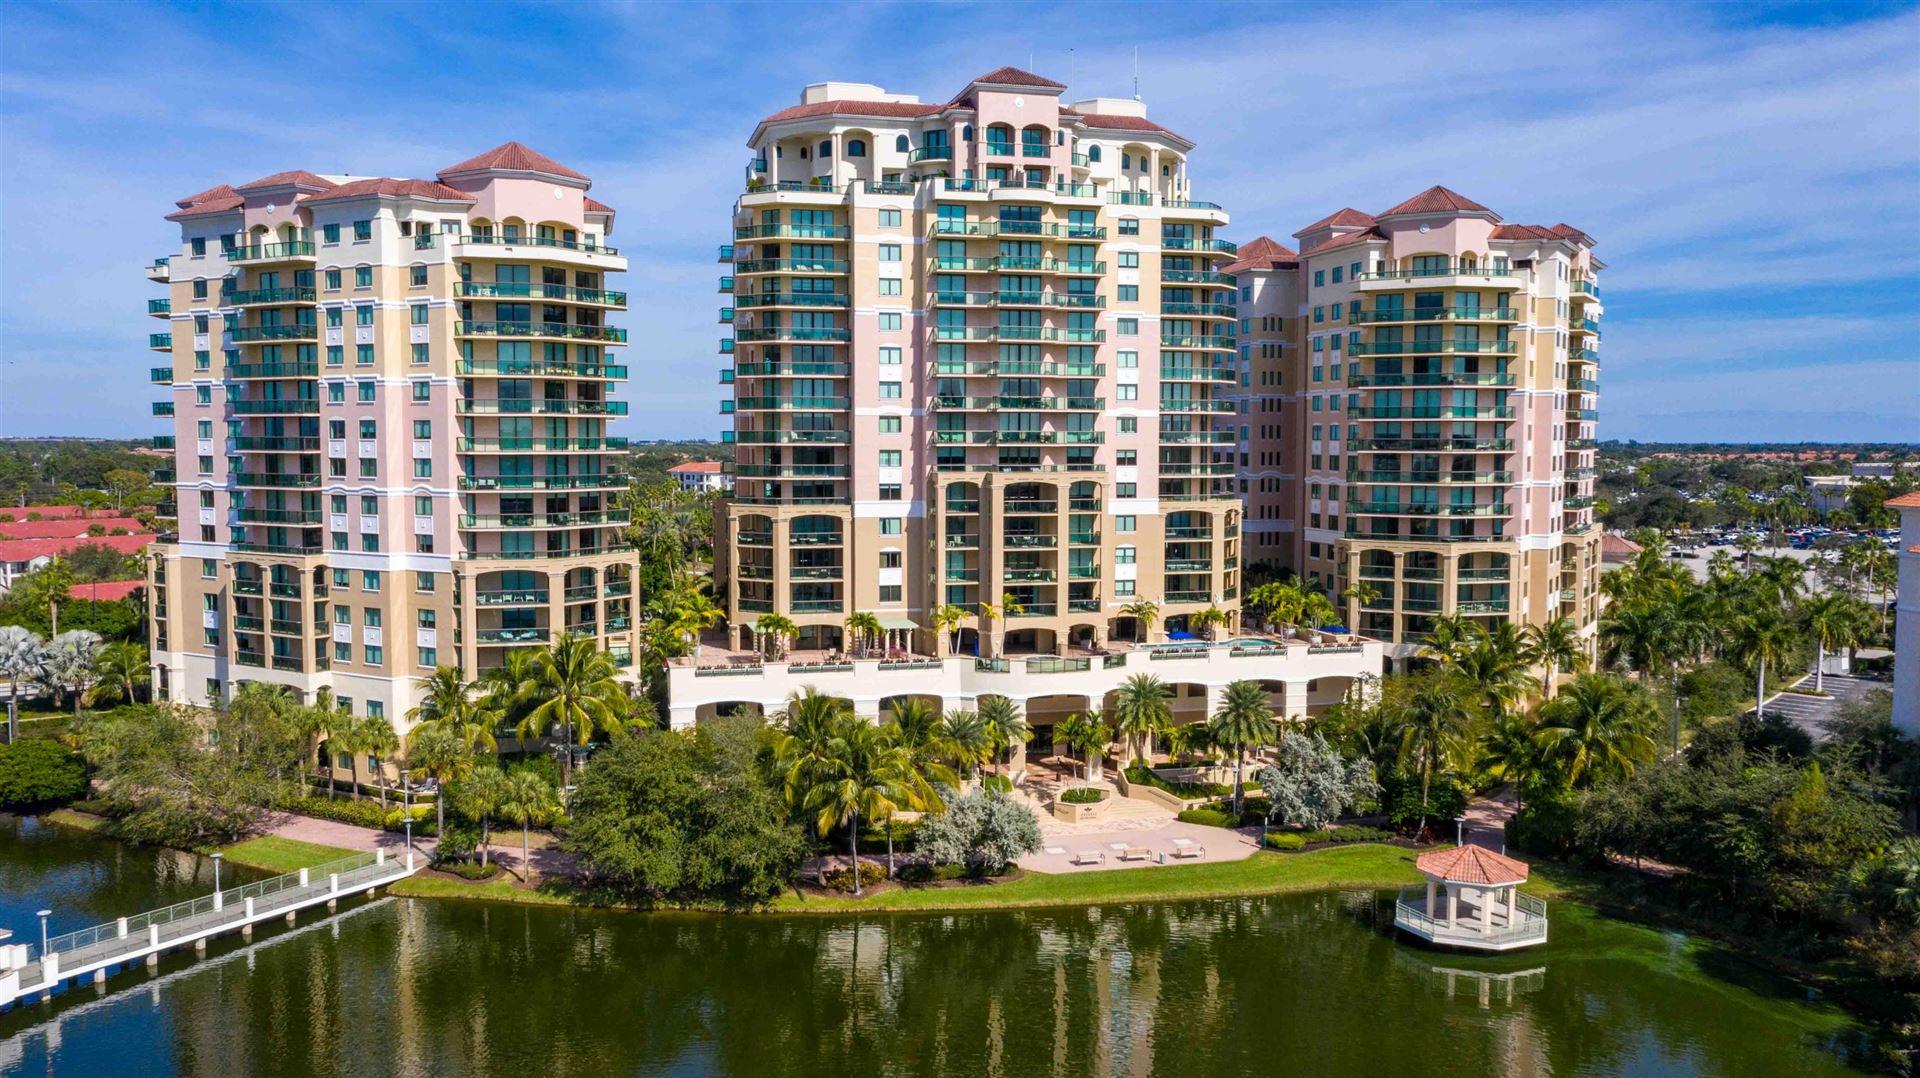 3620 Gardens Parkway #503b, Palm Beach Gardens, FL 33410 - #: RX-10585256